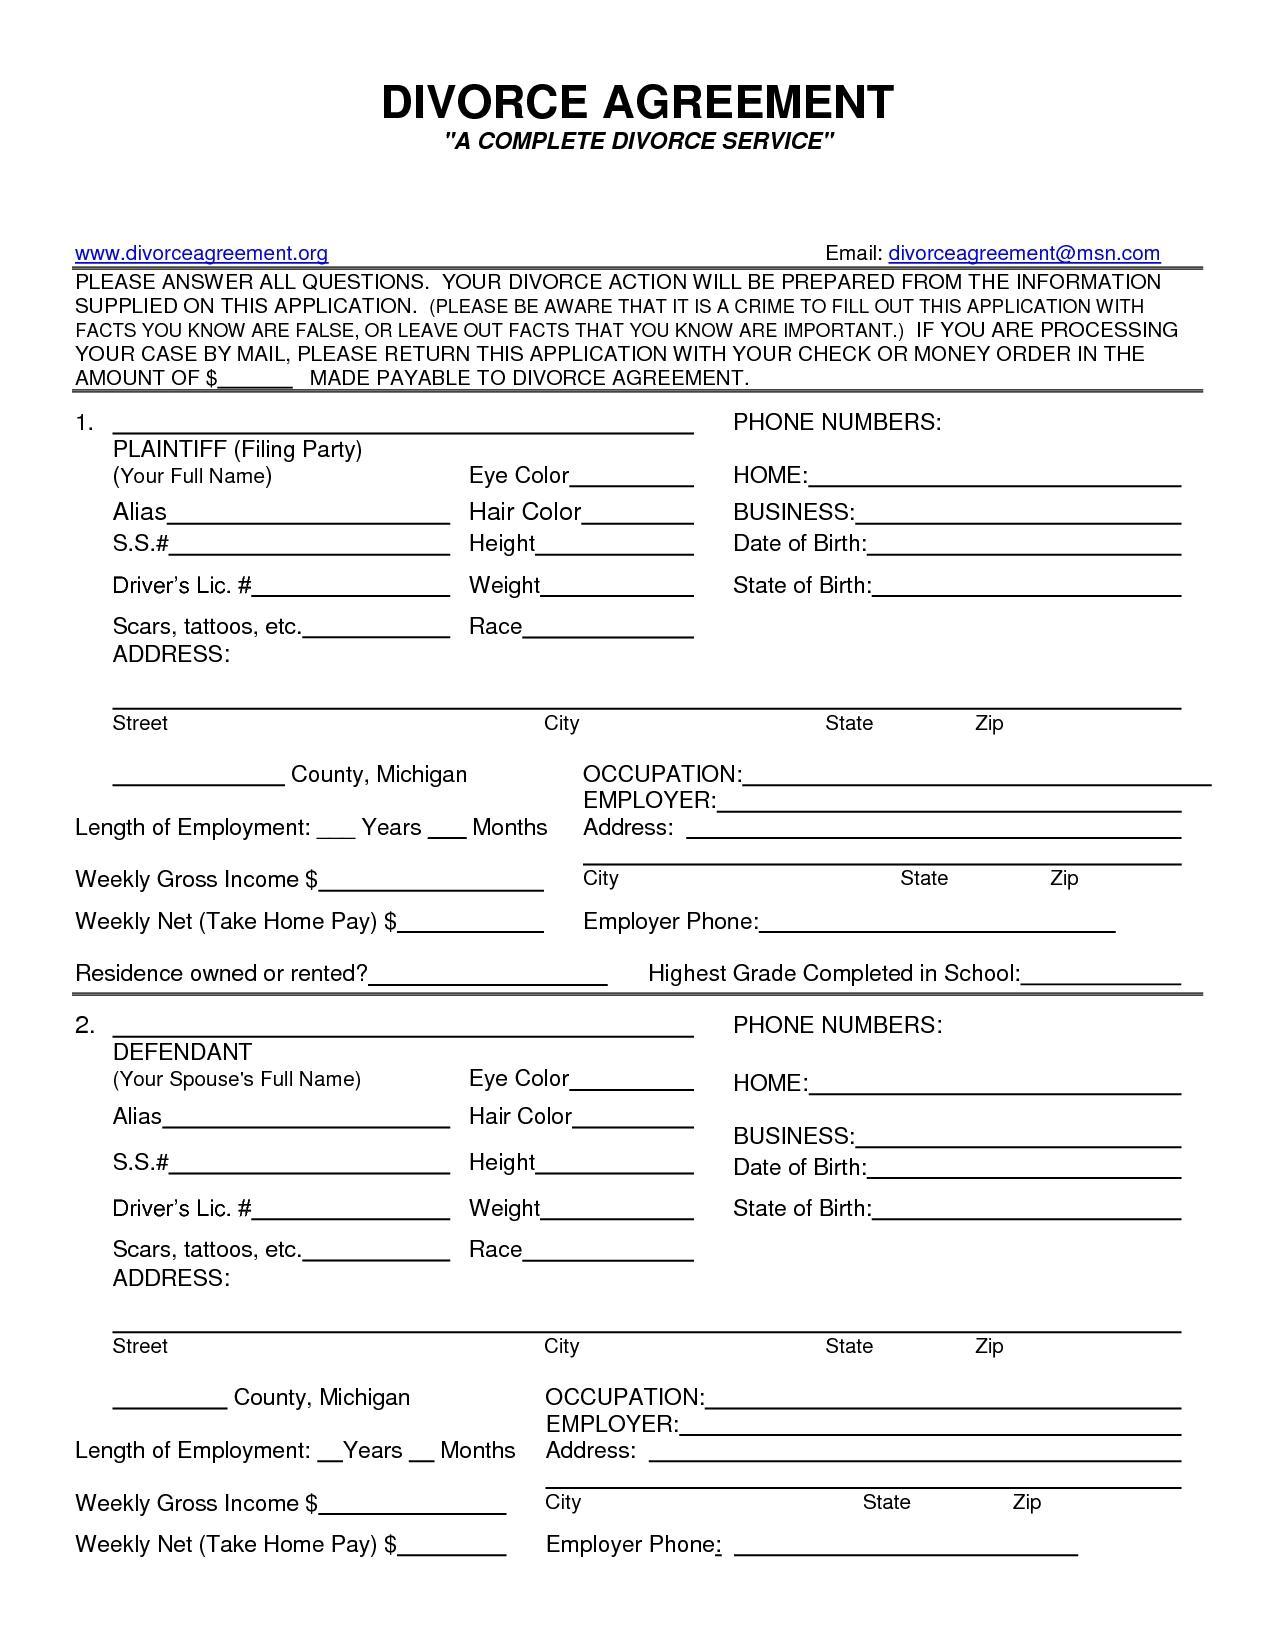 Wisconsin No Fault Divorce Forms